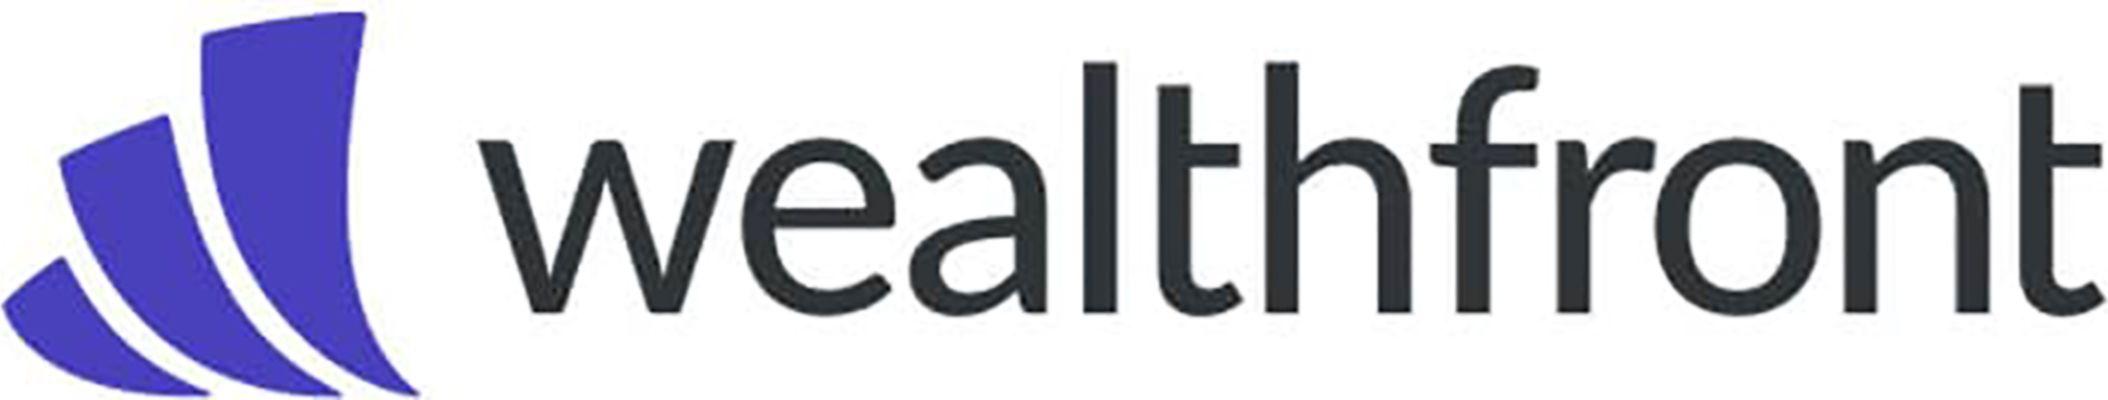 DarcMatter - Wealthfront Logo